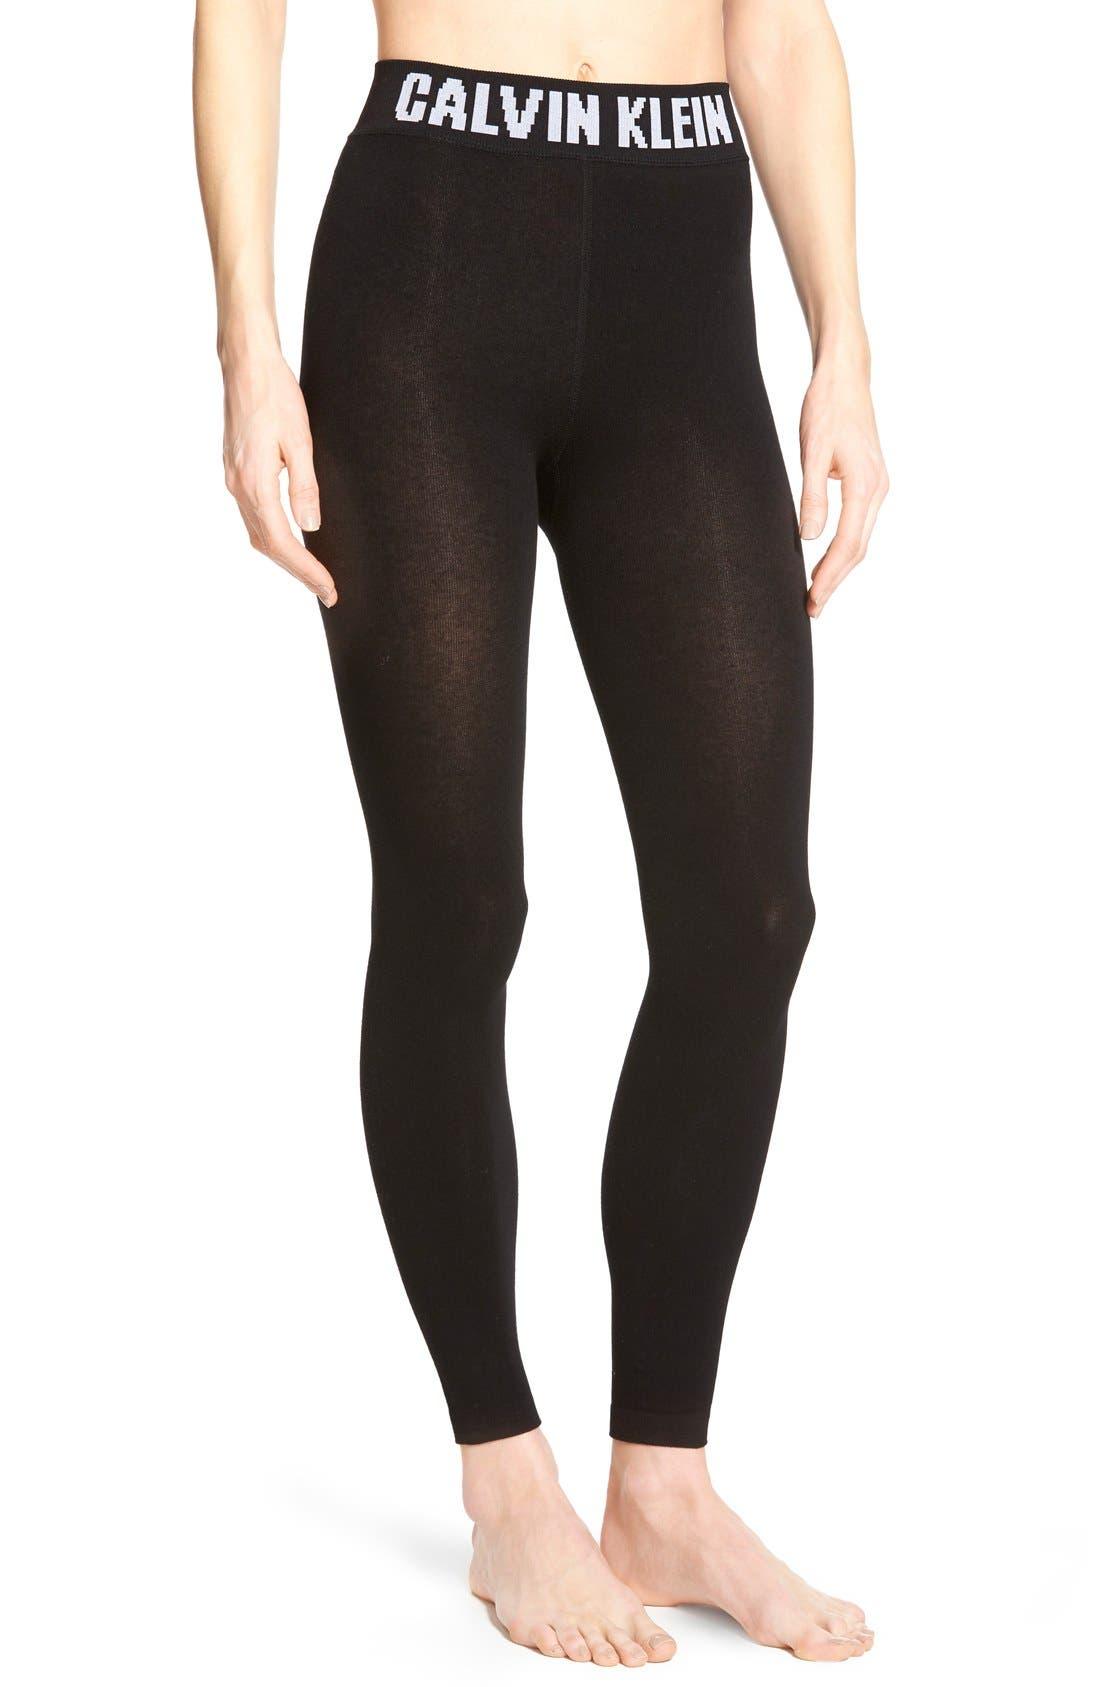 Alternate Image 1 Selected - Calvin Klein 'Retro' Logo Leggings